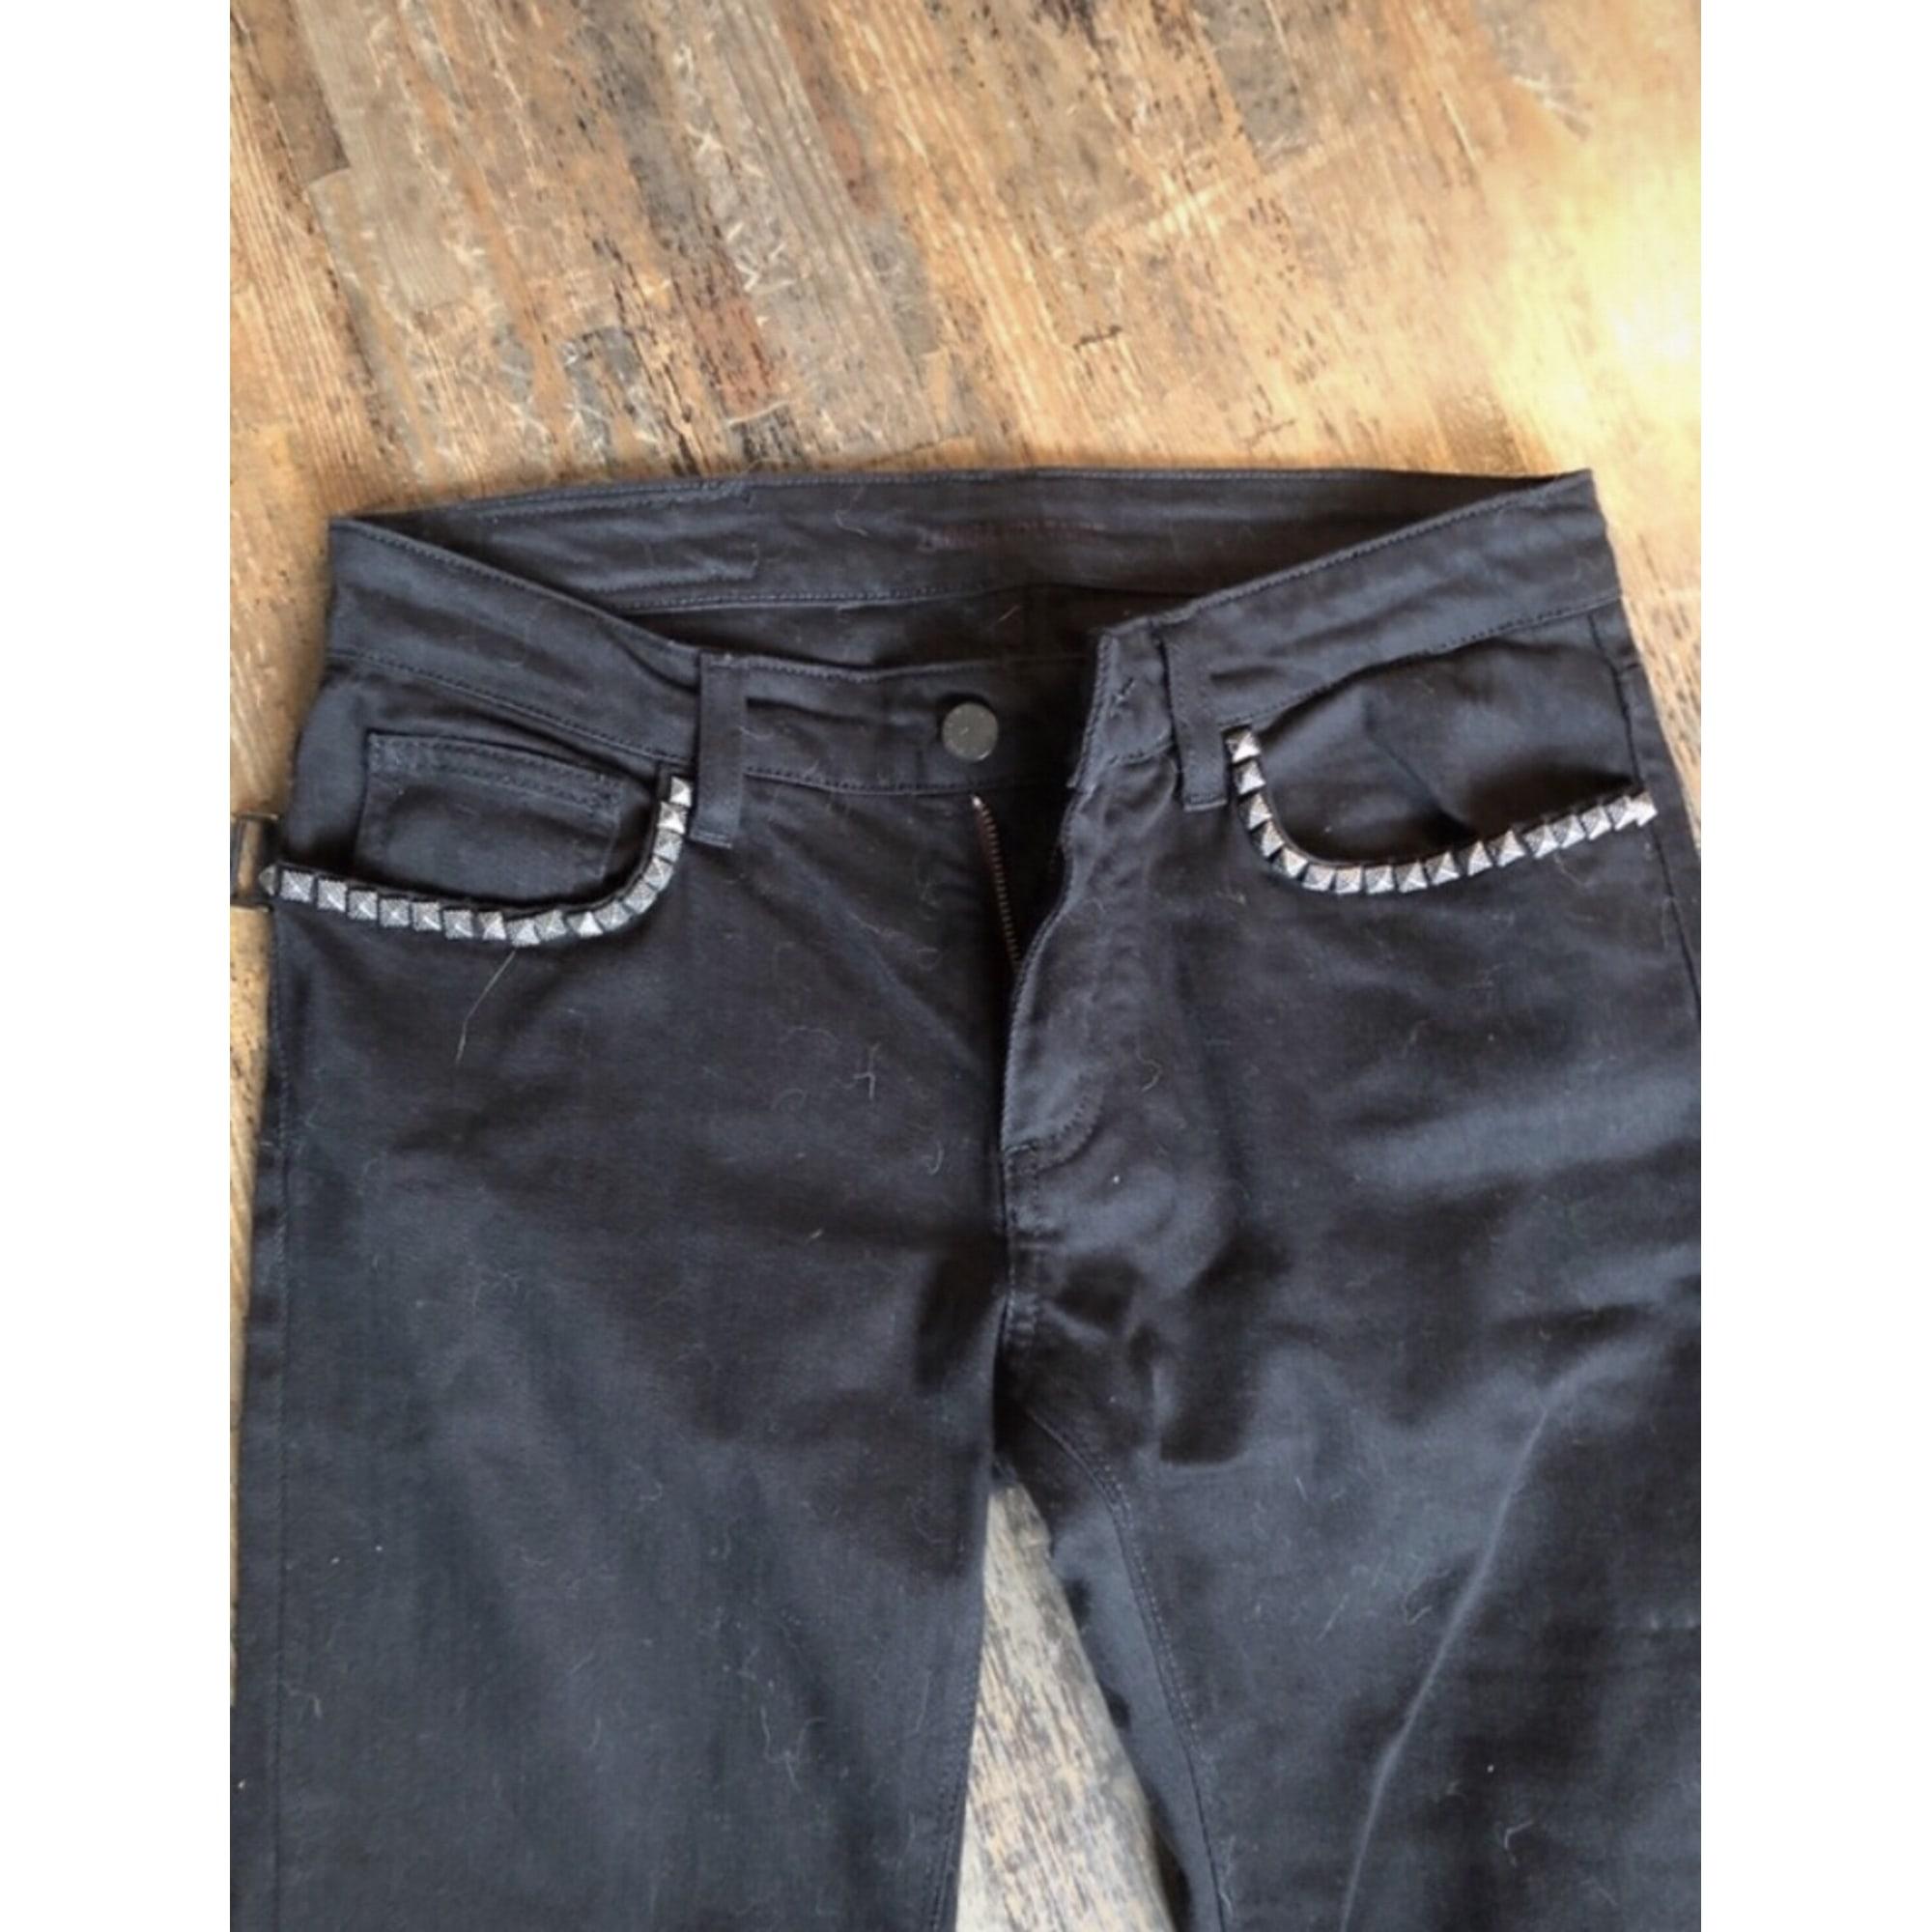 Straight Leg Jeans ZADIG & VOLTAIRE Black